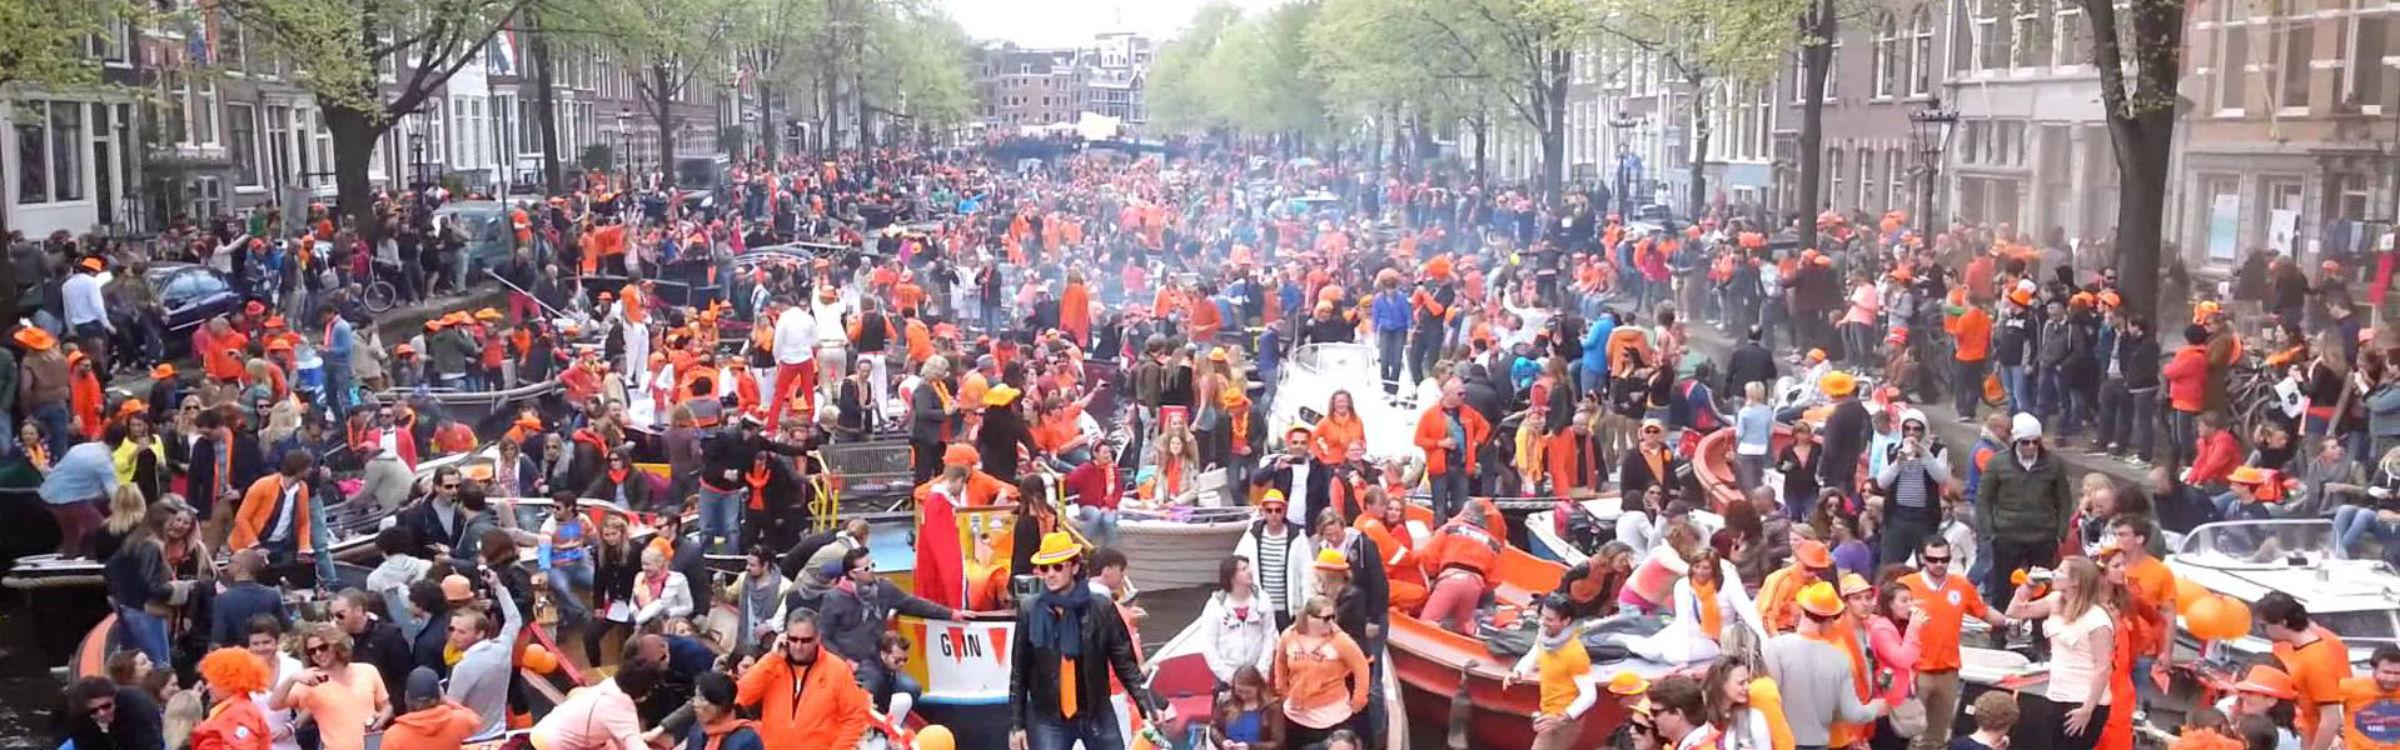 Koningsdag amsterdam header